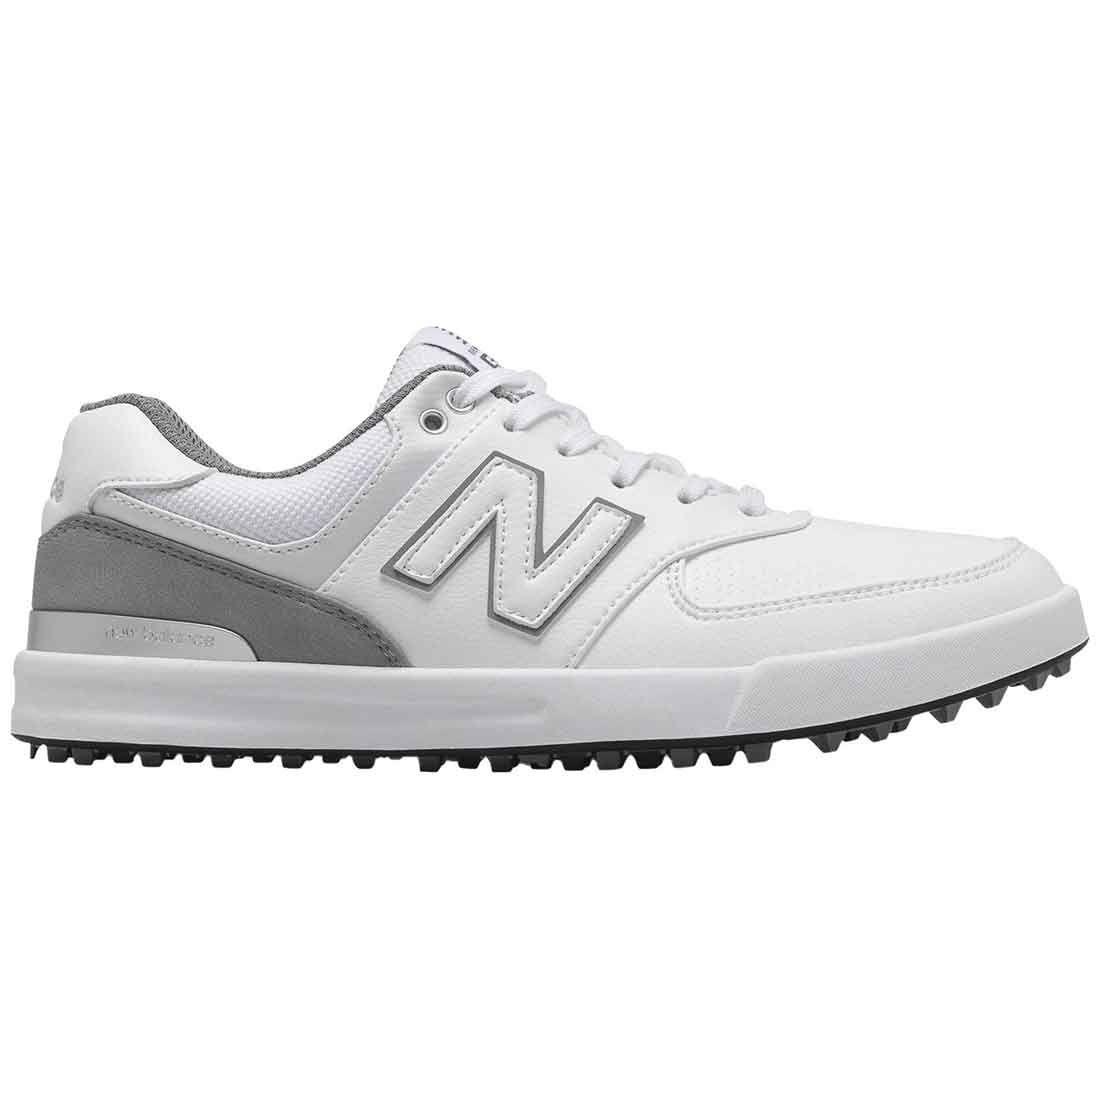 New Balance Women's 574 Greens Golf Shoes White